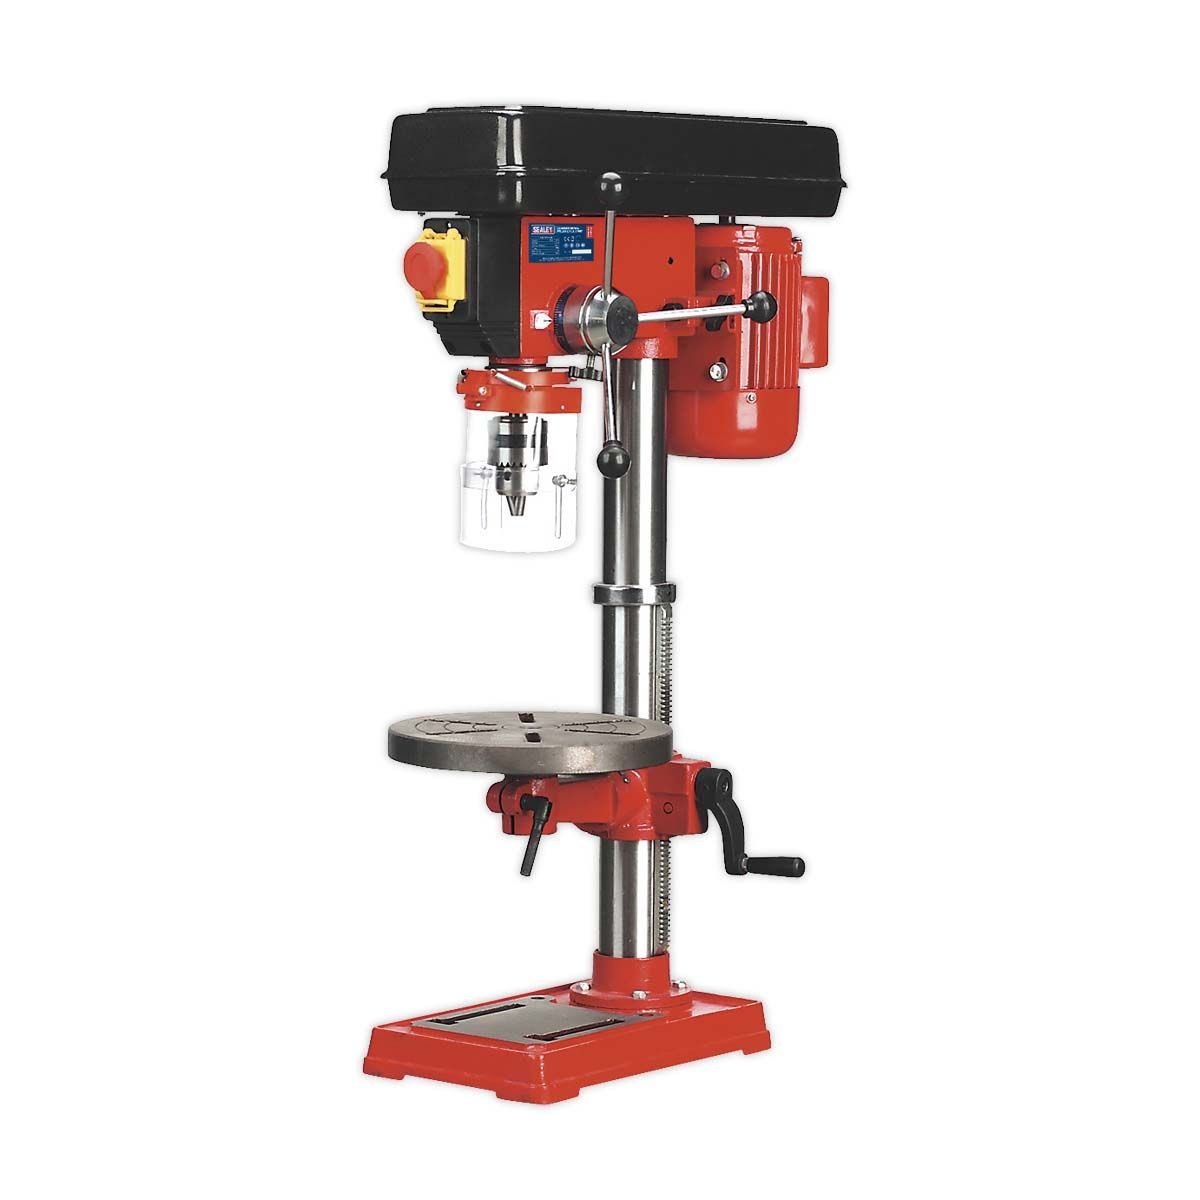 Sealey Pillar Drill Bench 12-Speed 840mm Height 370W/230V